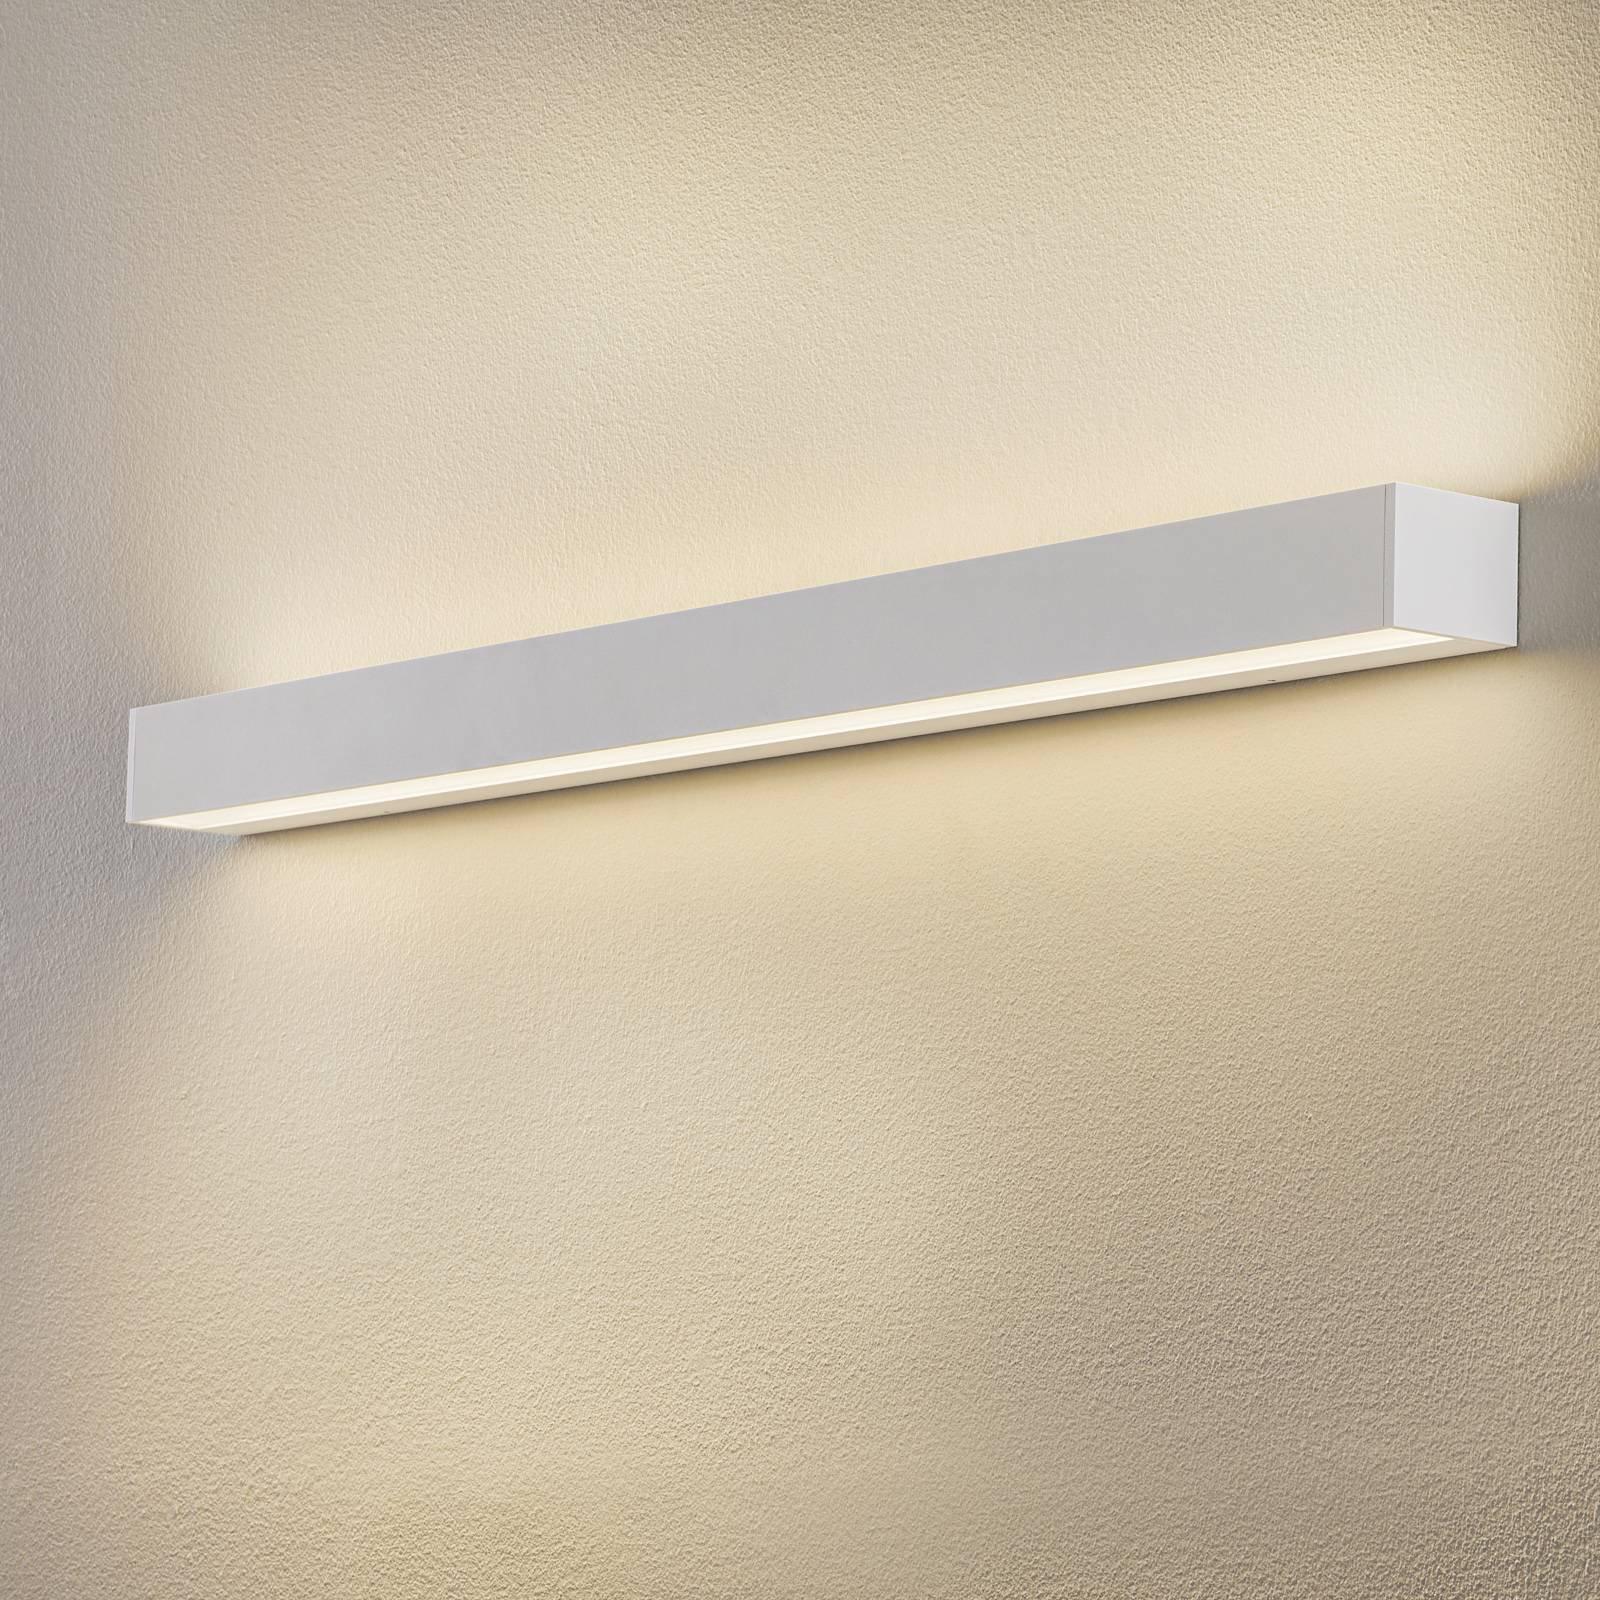 BEGA 50806 LED-vegglampe 930 hvit 122 cm 12 360 lm